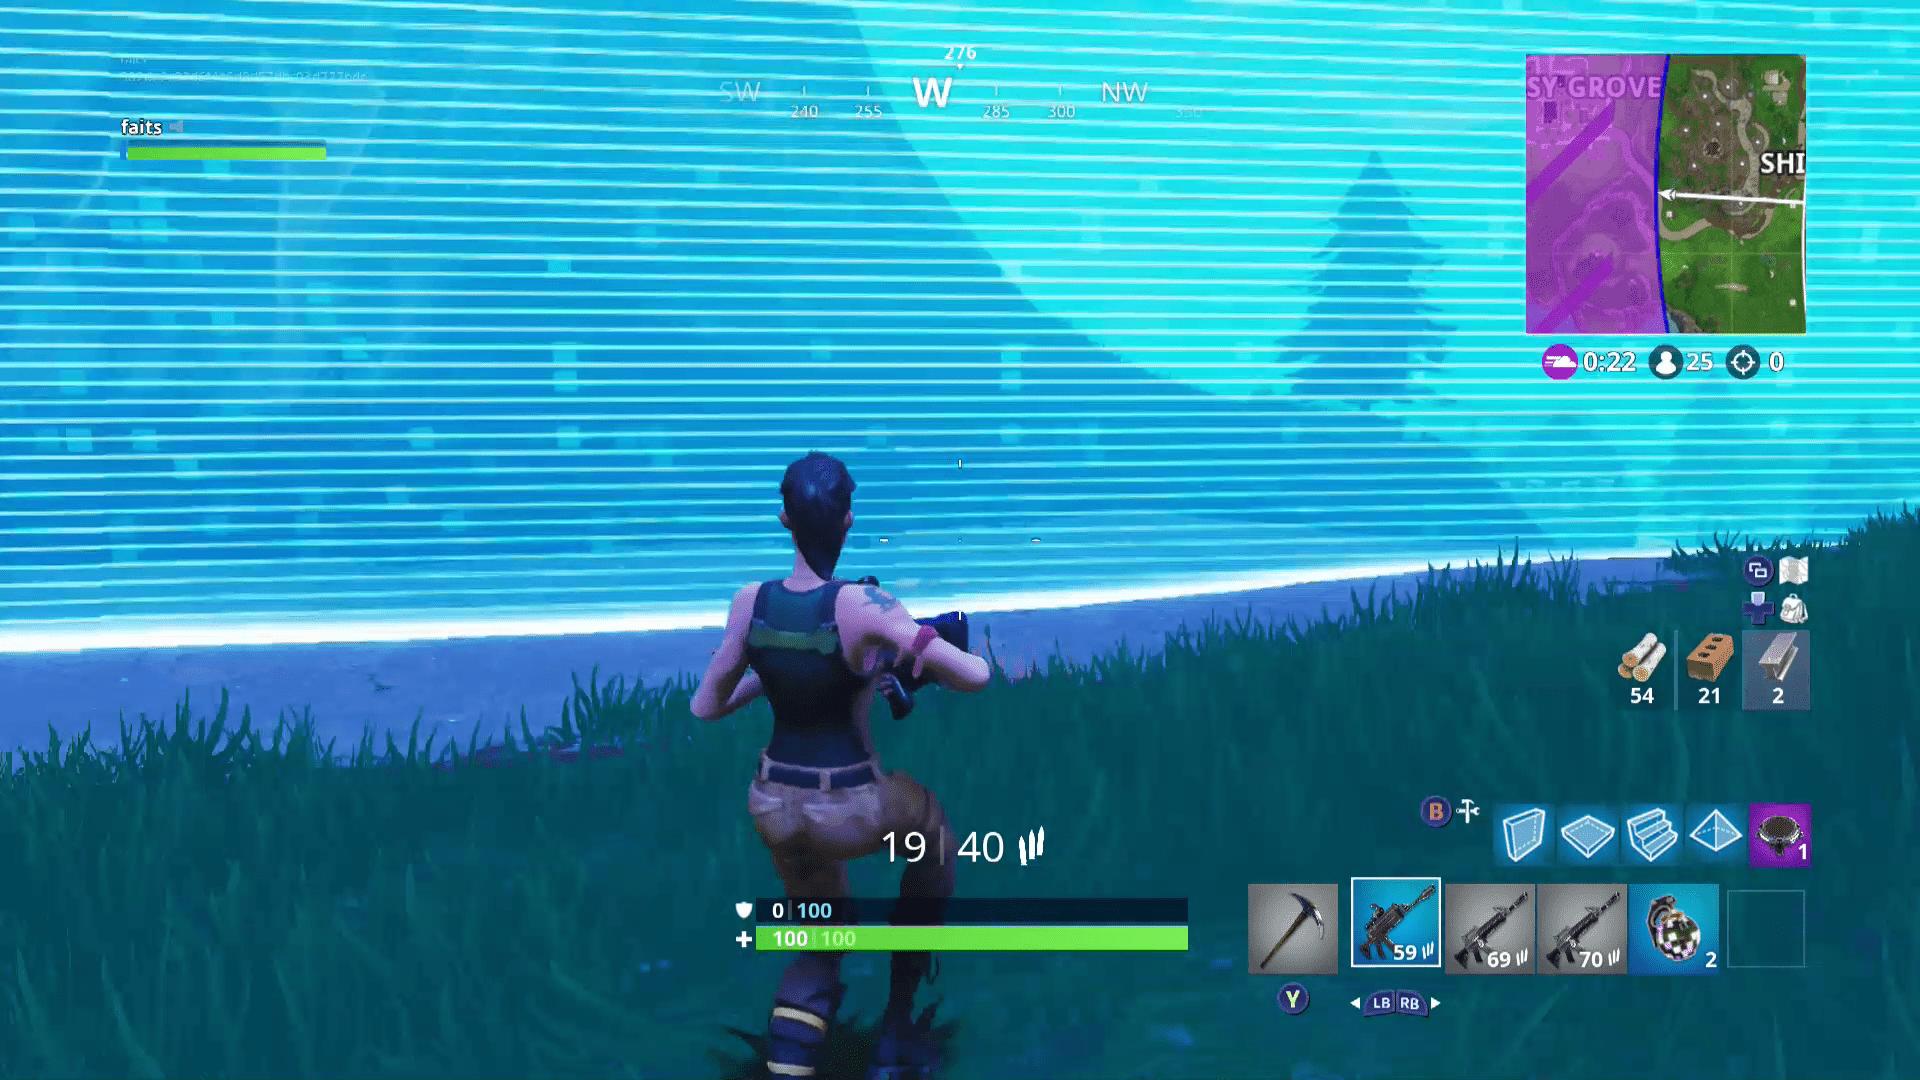 A screenshot of the advancing storm in Fortnite.